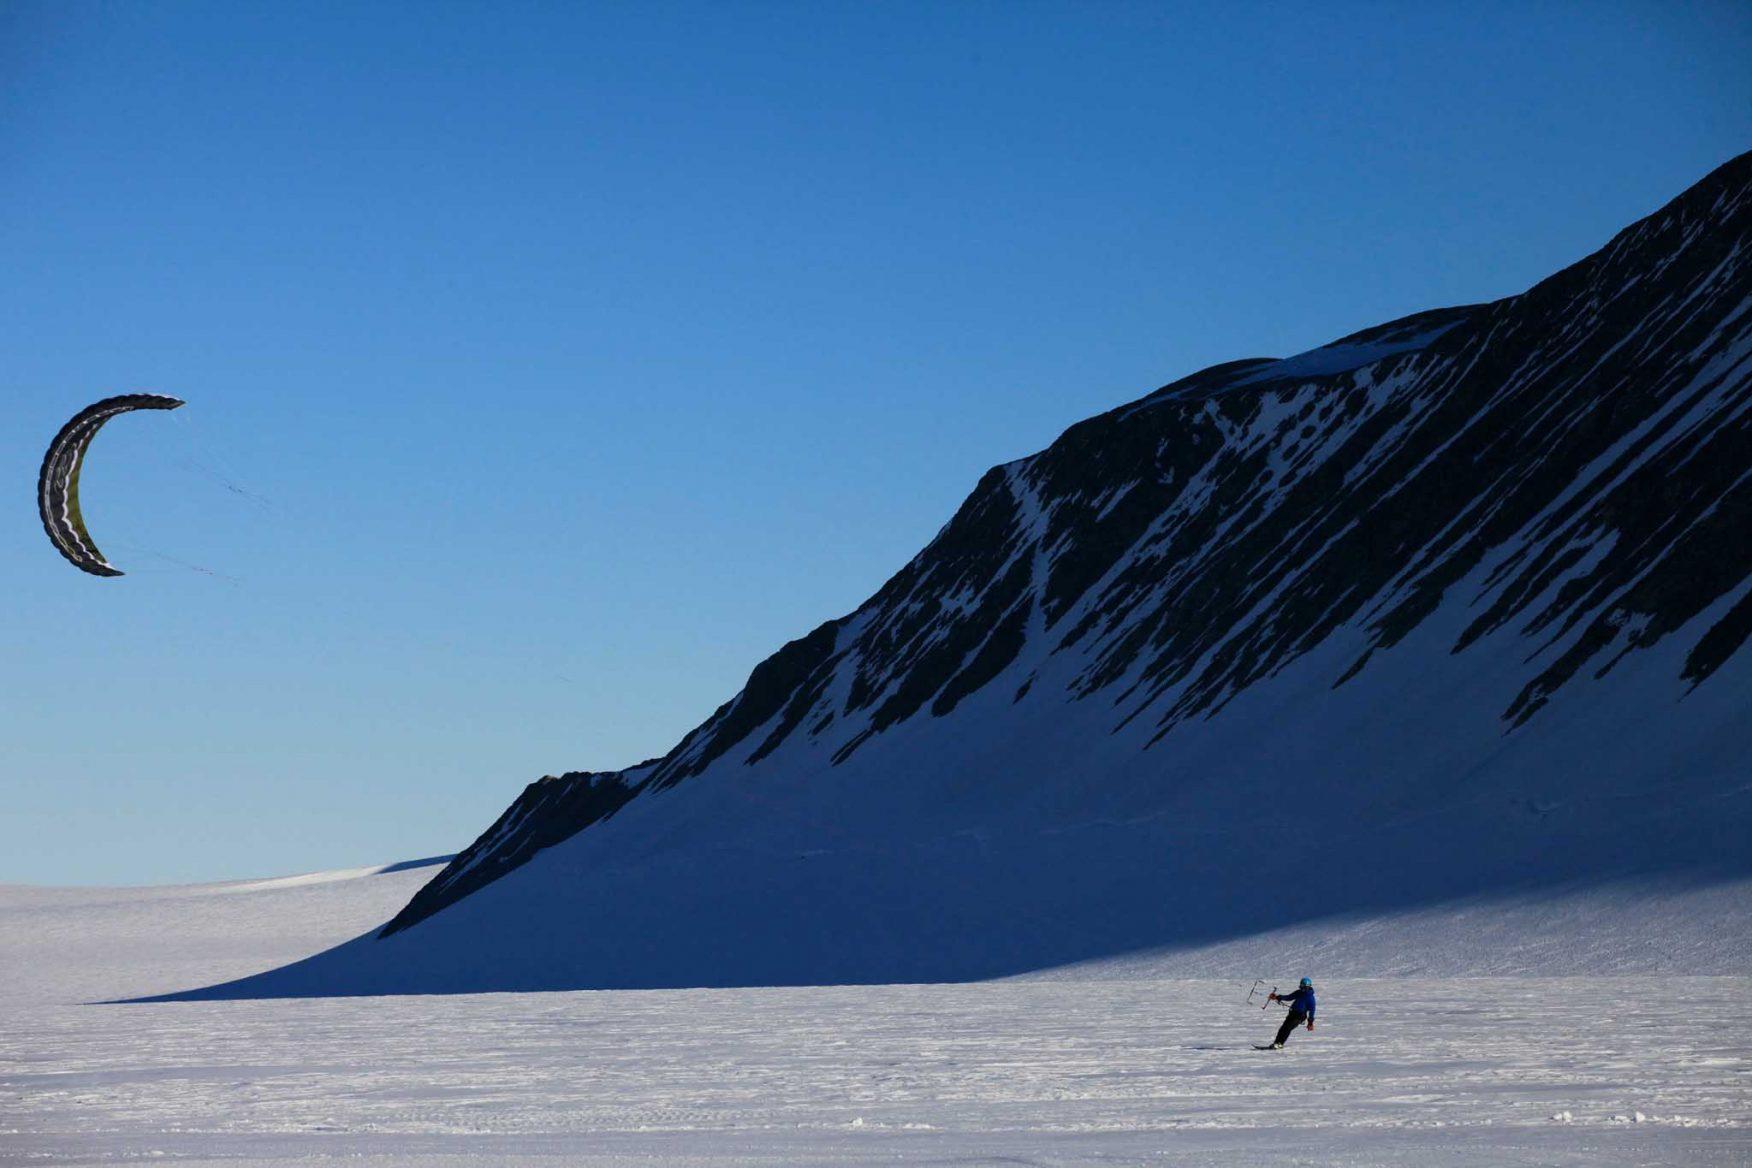 antarctic-expedition-kite-skiing